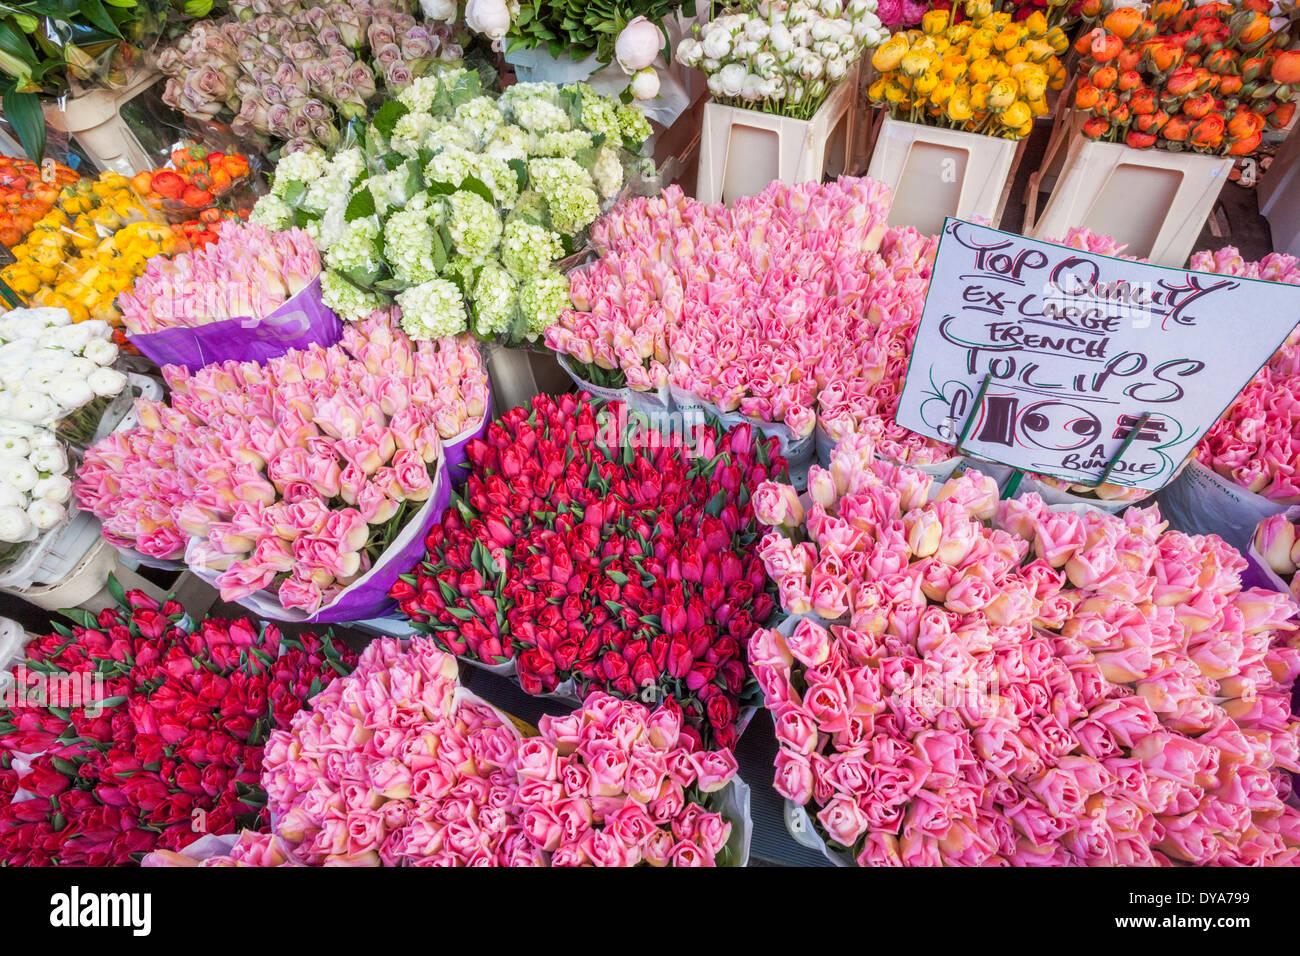 England London Columbia Road Flower Market Flower Display Stock Photo Alamy